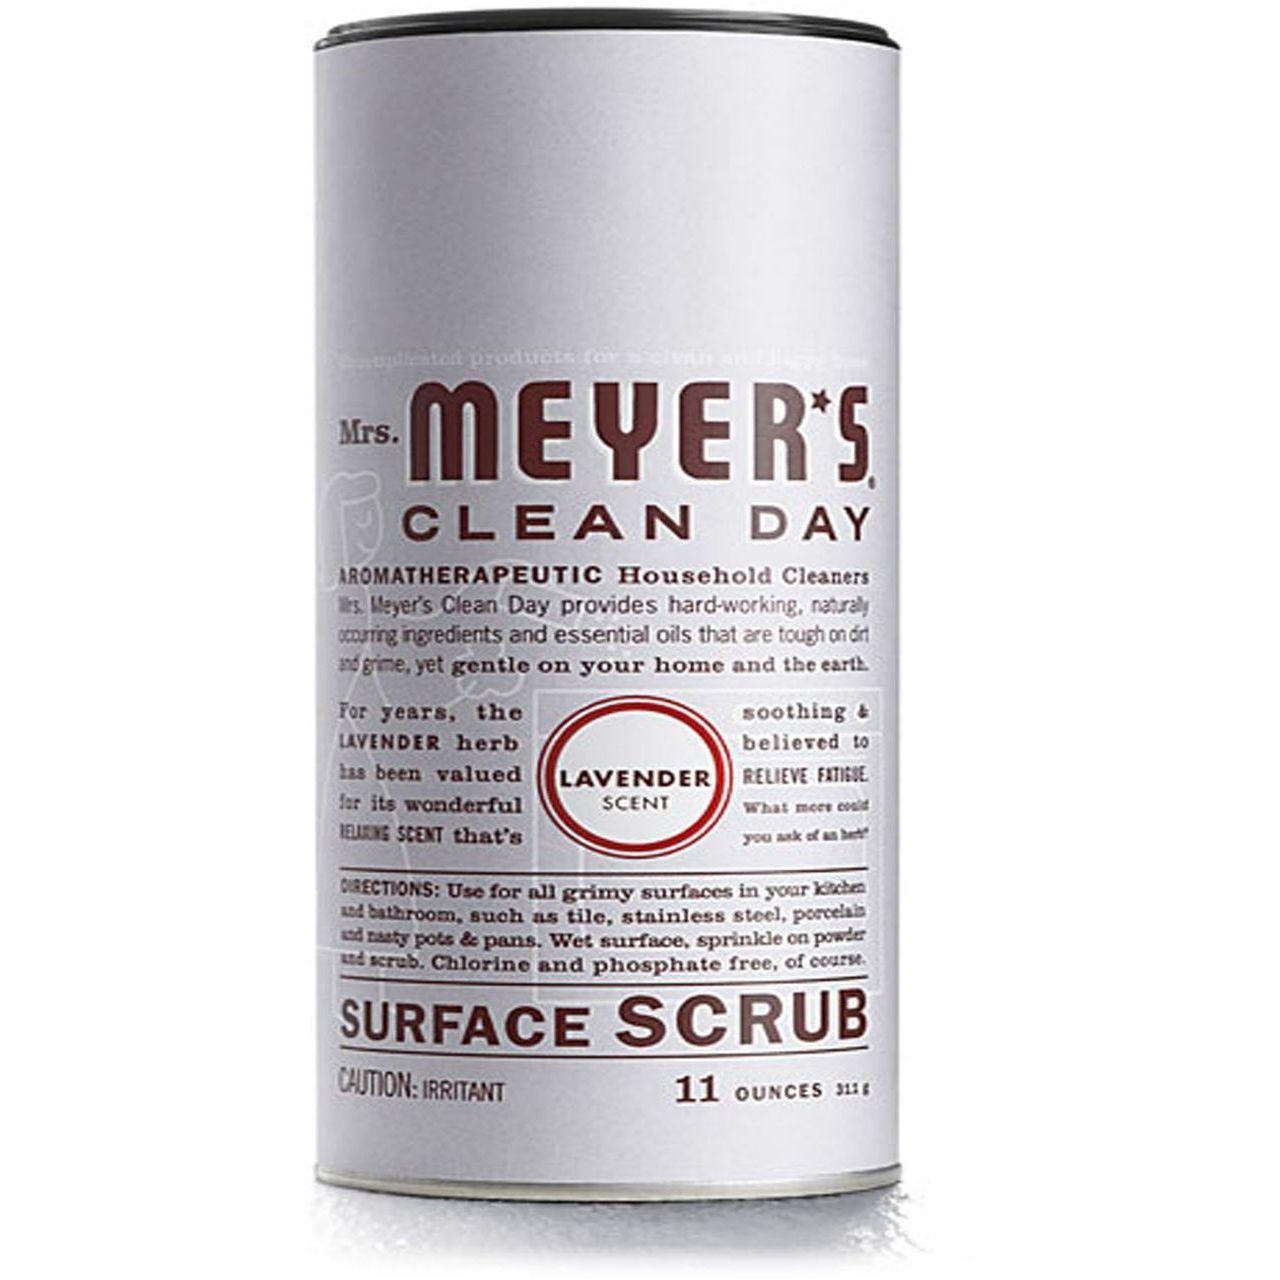 Caldrea 11 oz Lavander Clean Day Surface Scrub